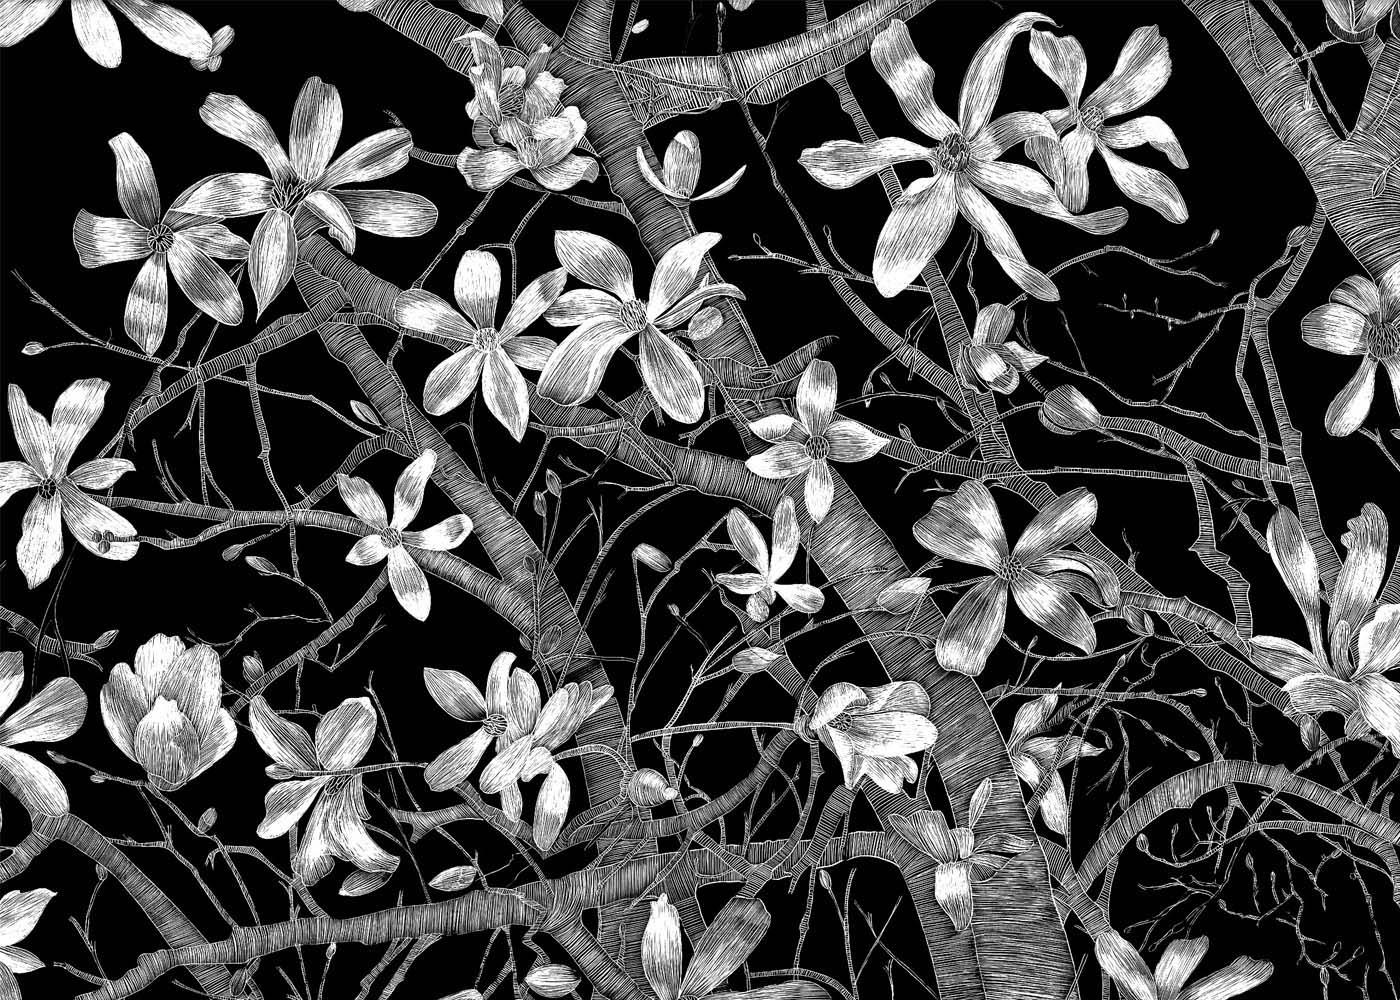 Open Magnolias